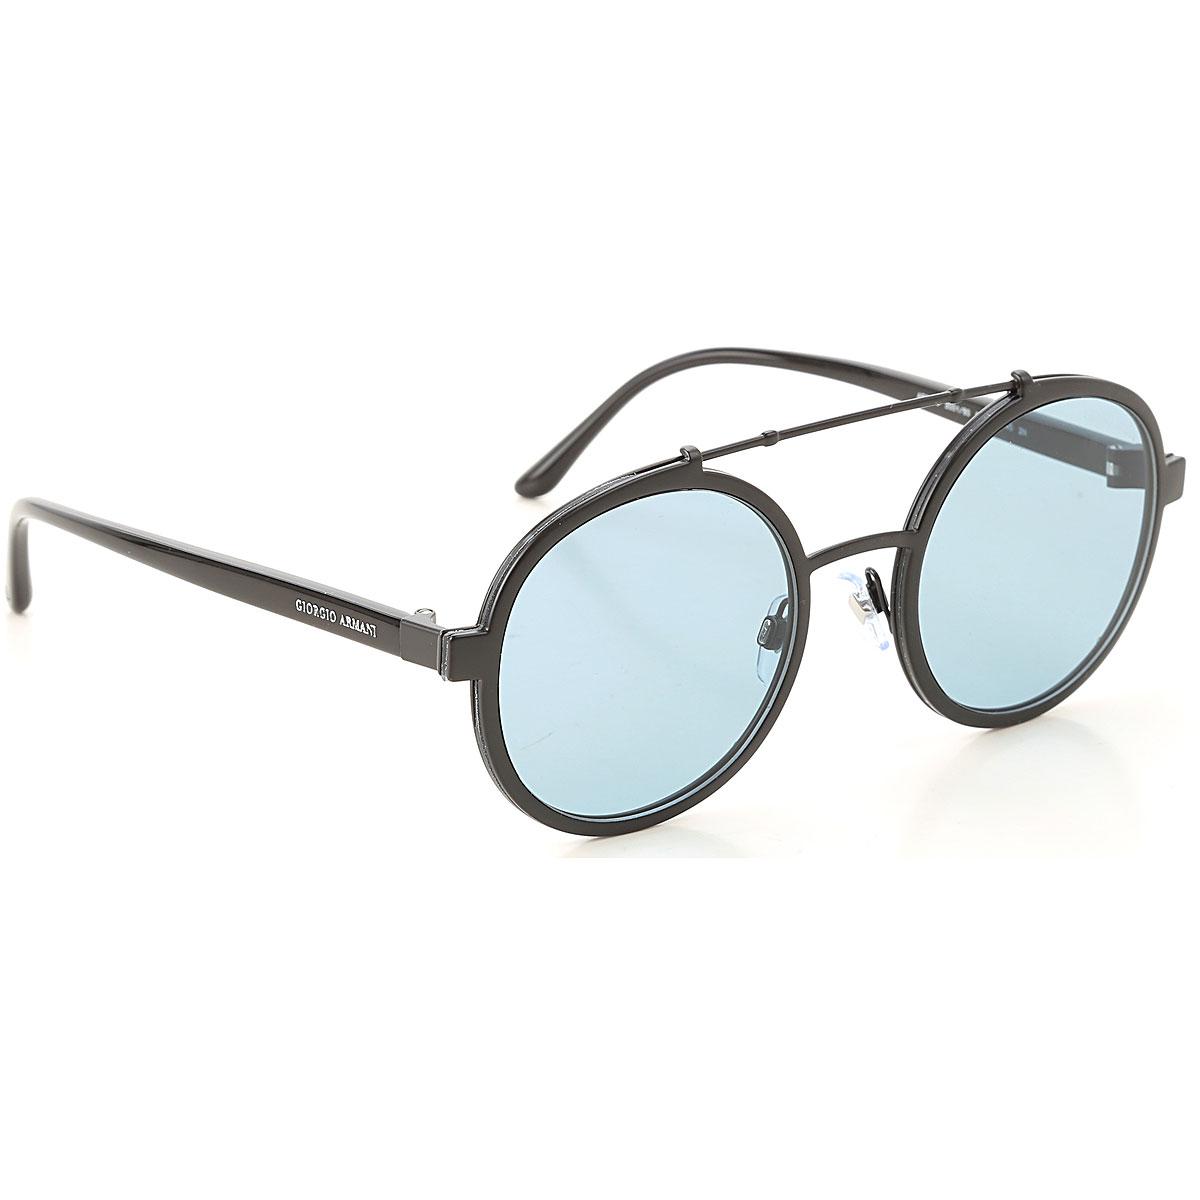 Giorgio Armani Sunglasses On Sale, Black Matt, 2019